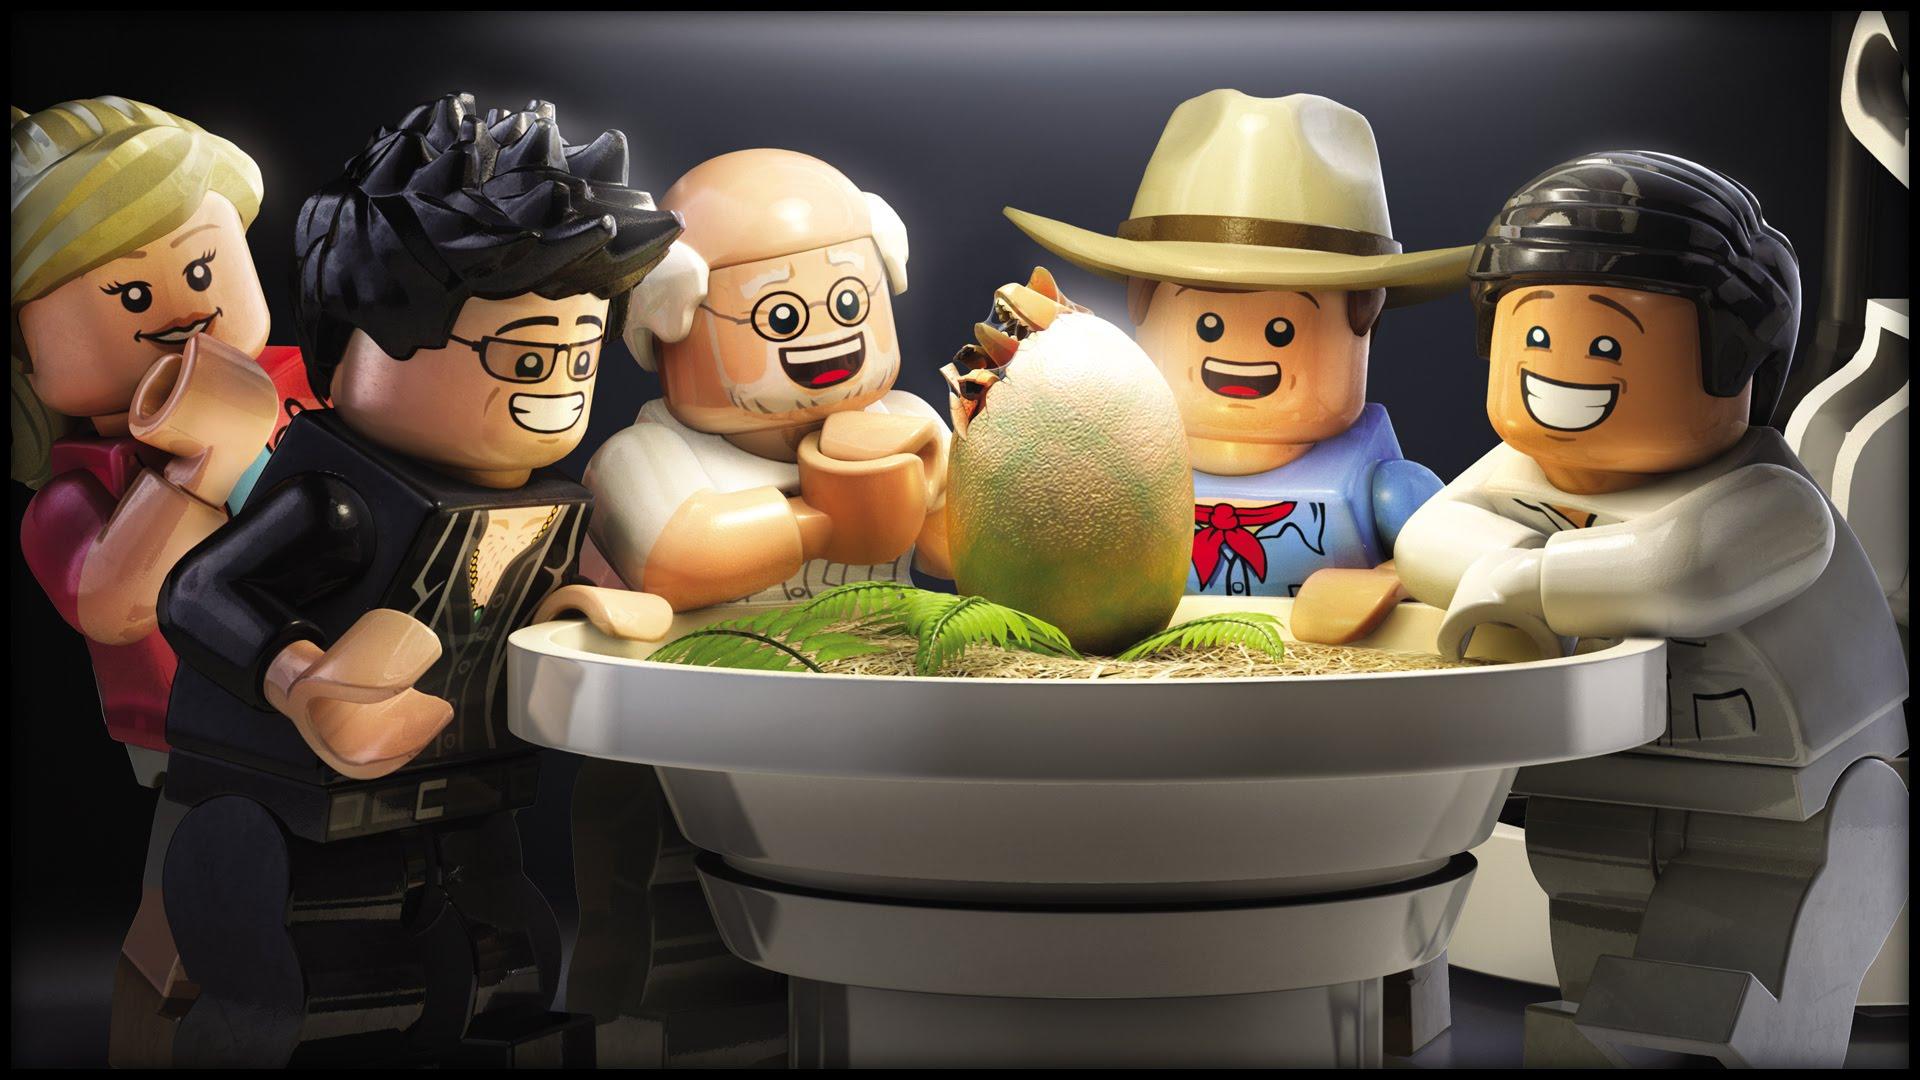 Lego Jurassic World - VGProfessional Review (5)